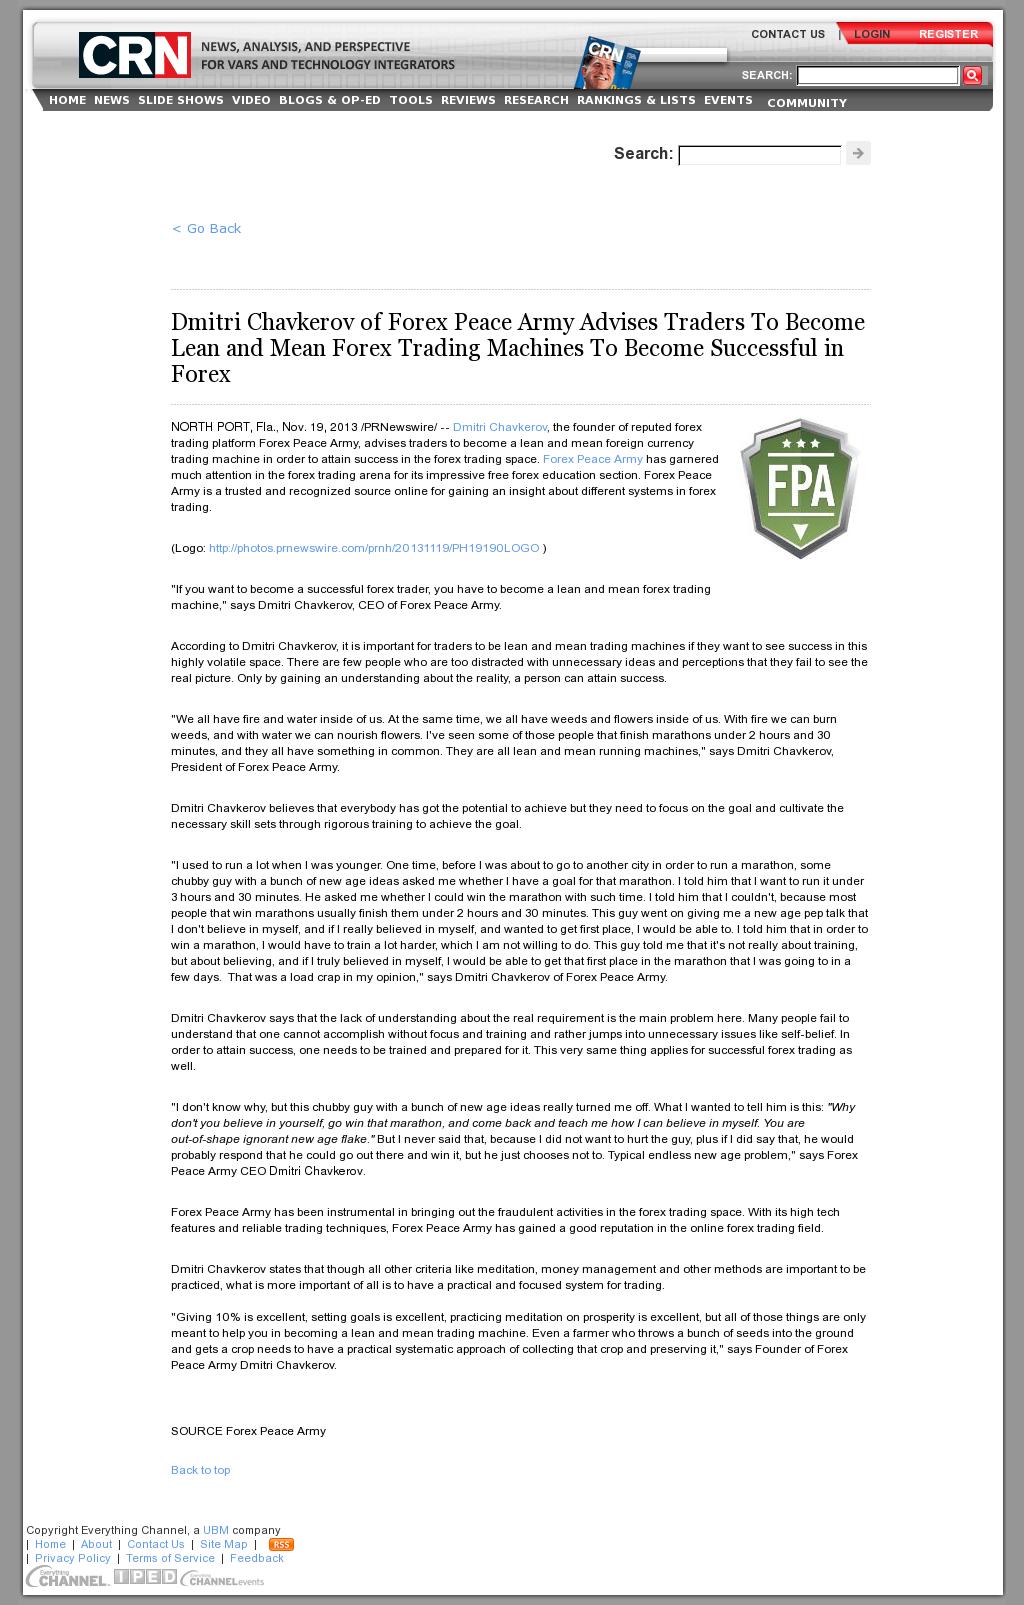 Dmitri Chavkerov - CRN - Lean Forex Trading